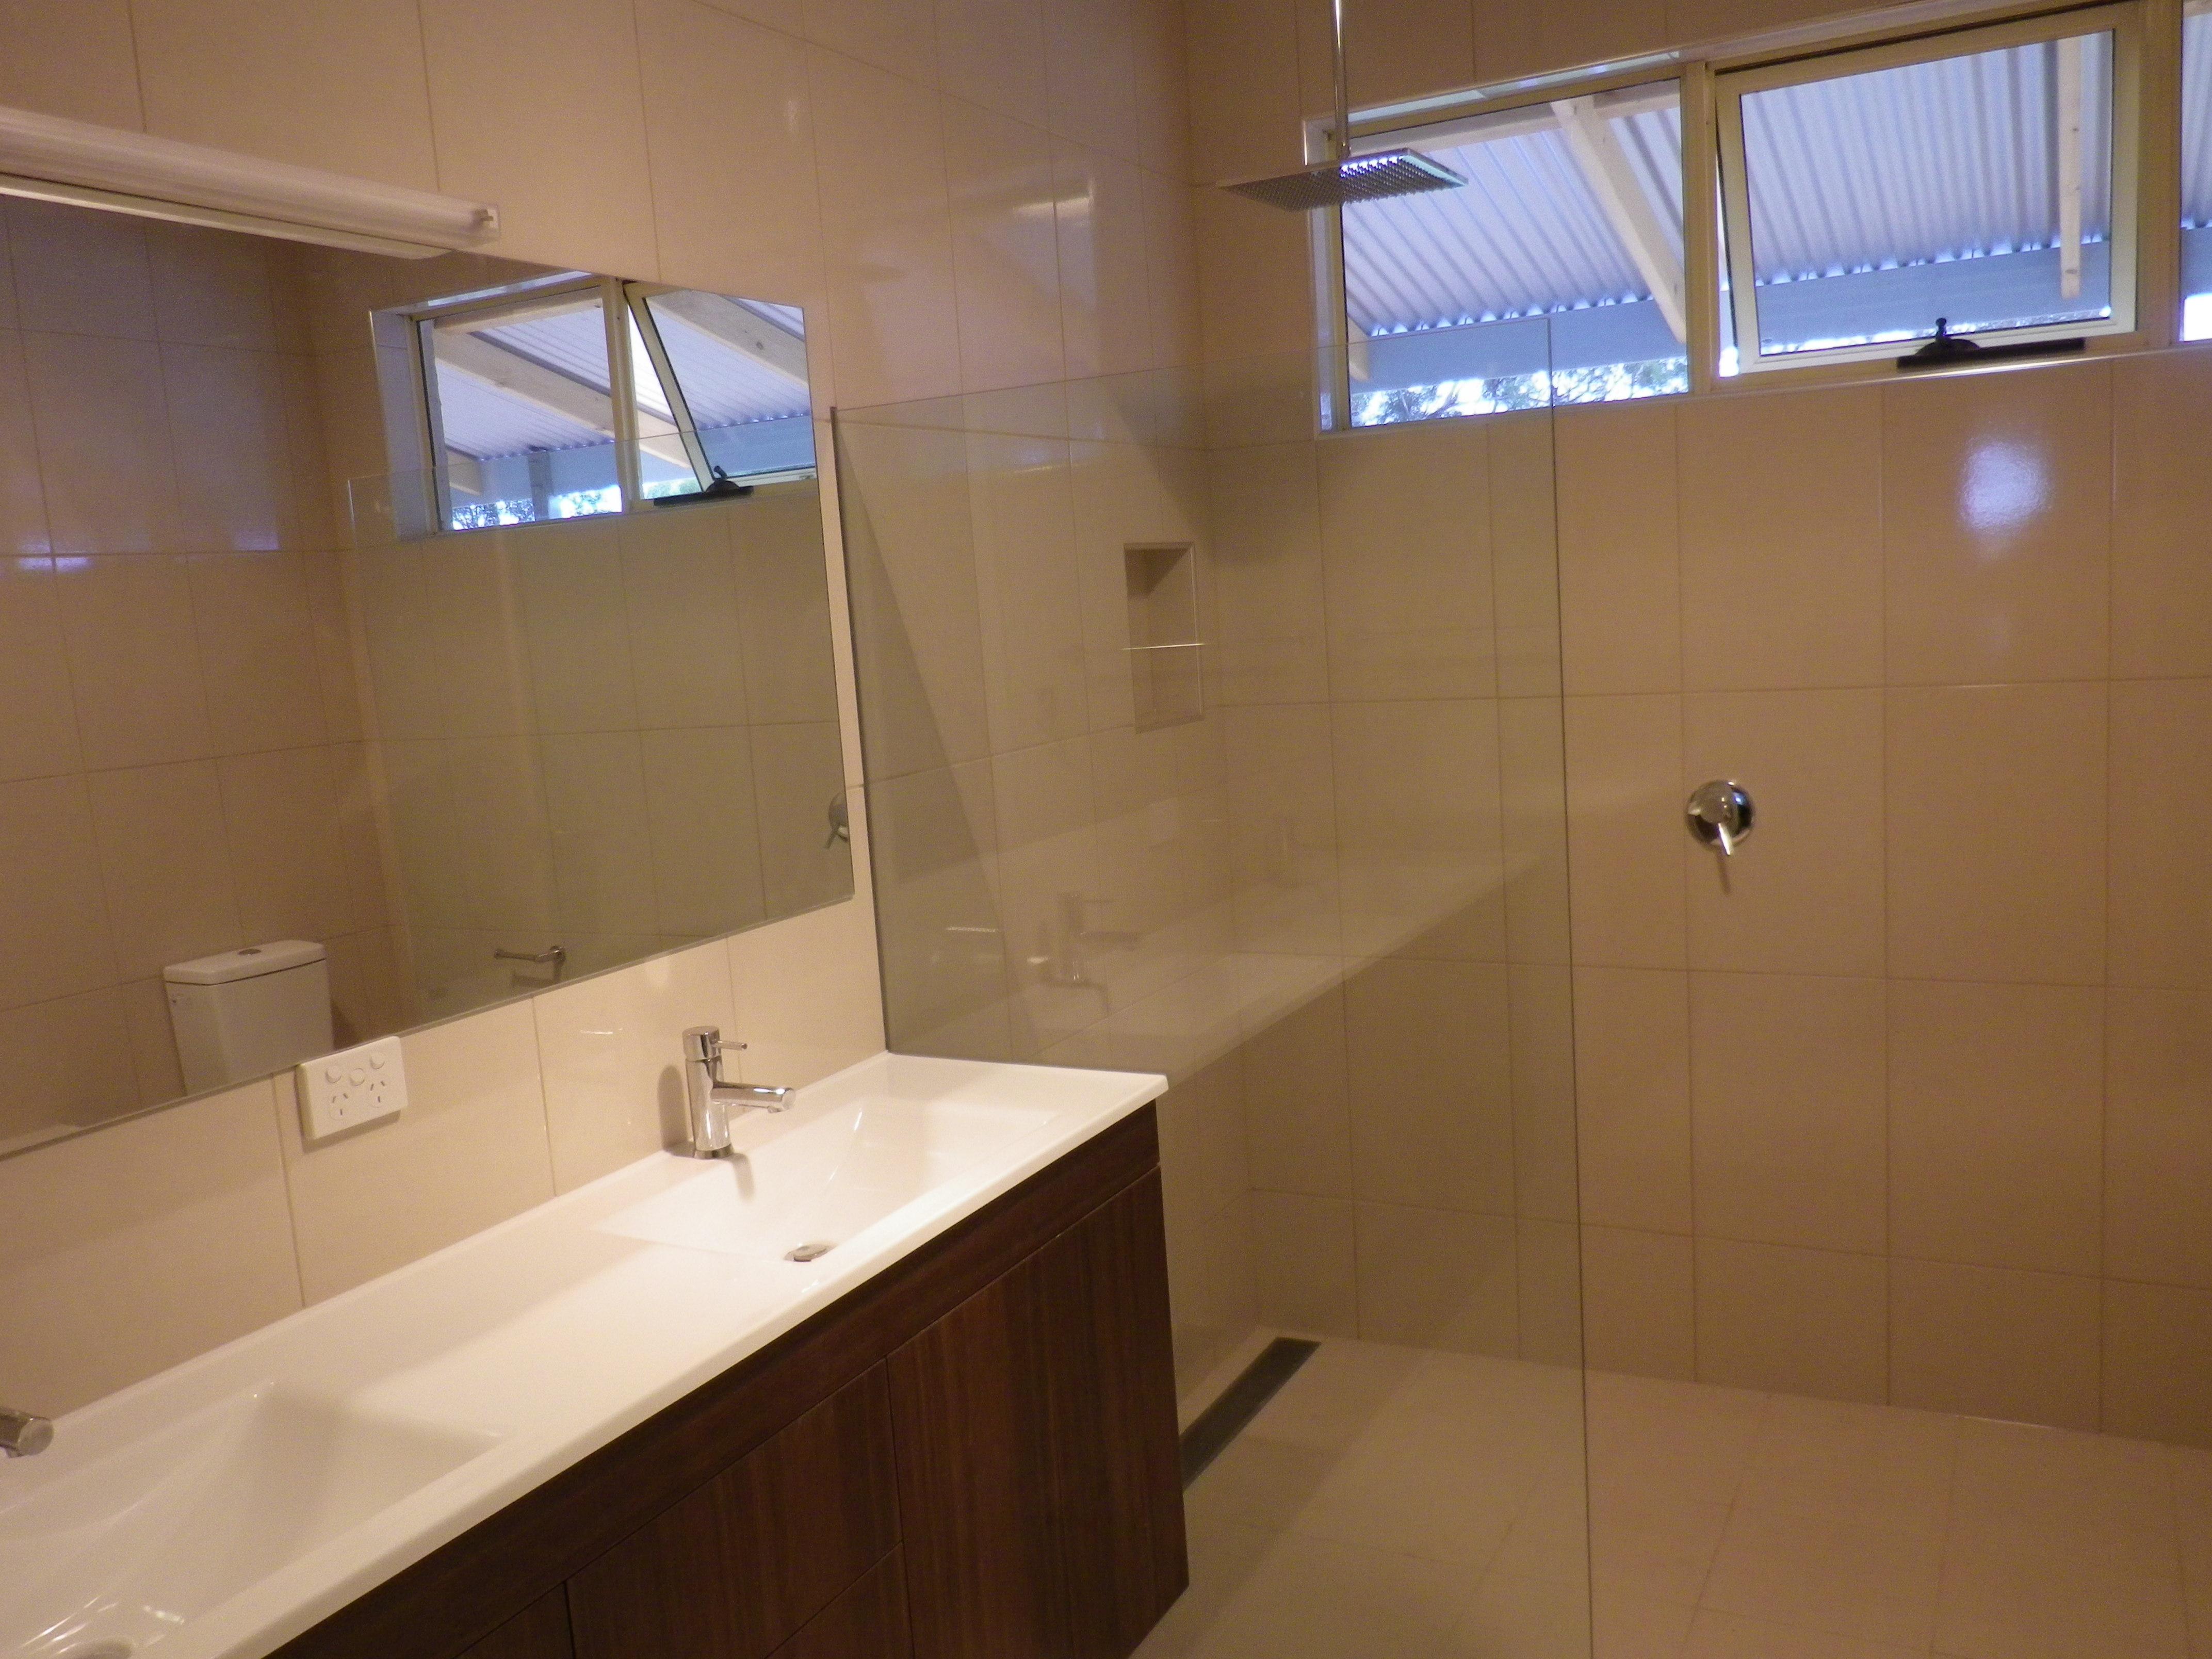 Frameless shower screen and shower grate